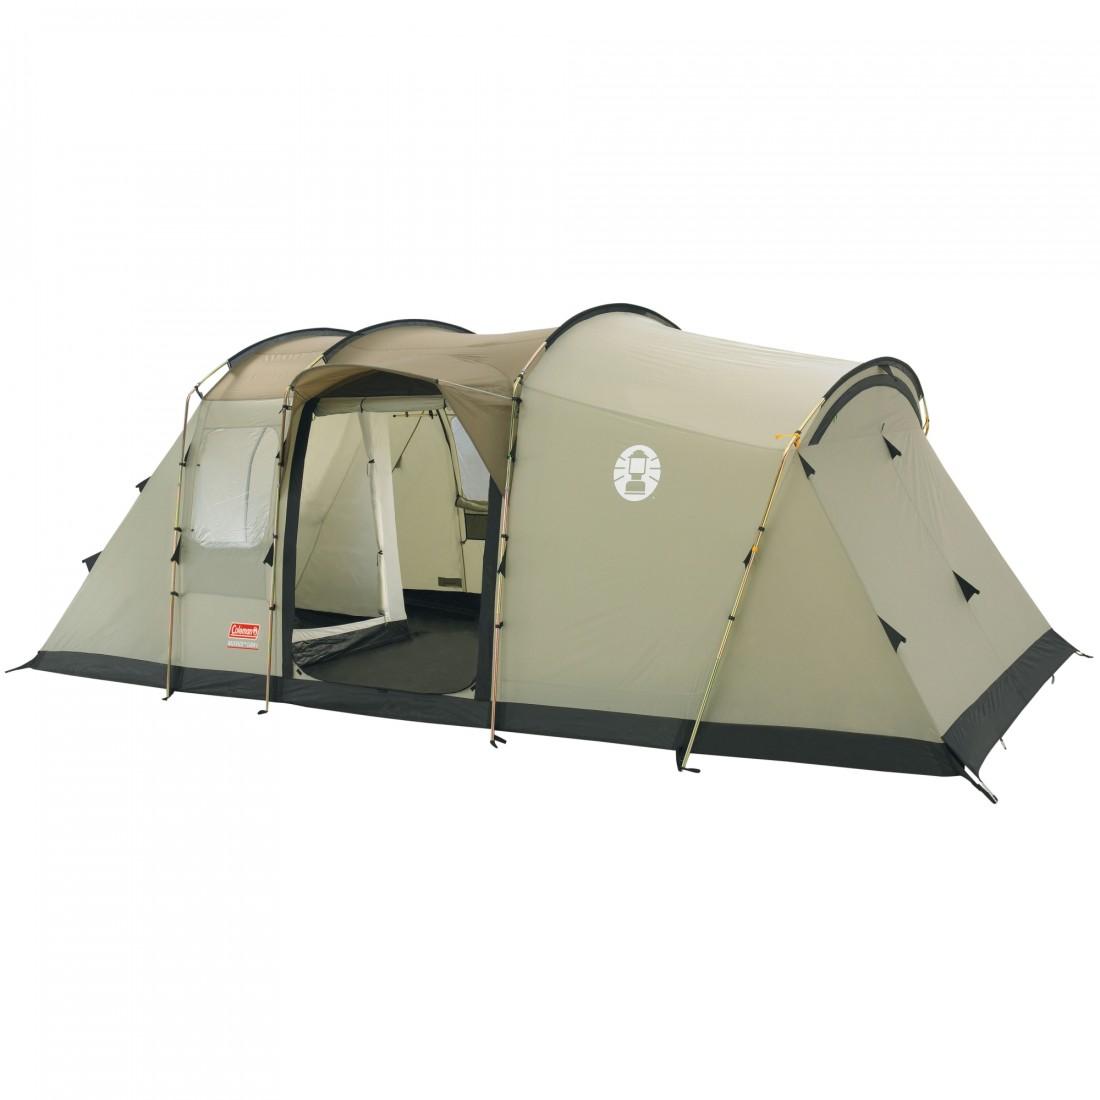 coleman 6 personen tunnel zelt mackenzie cabin 6 ws 4000mm ebay. Black Bedroom Furniture Sets. Home Design Ideas